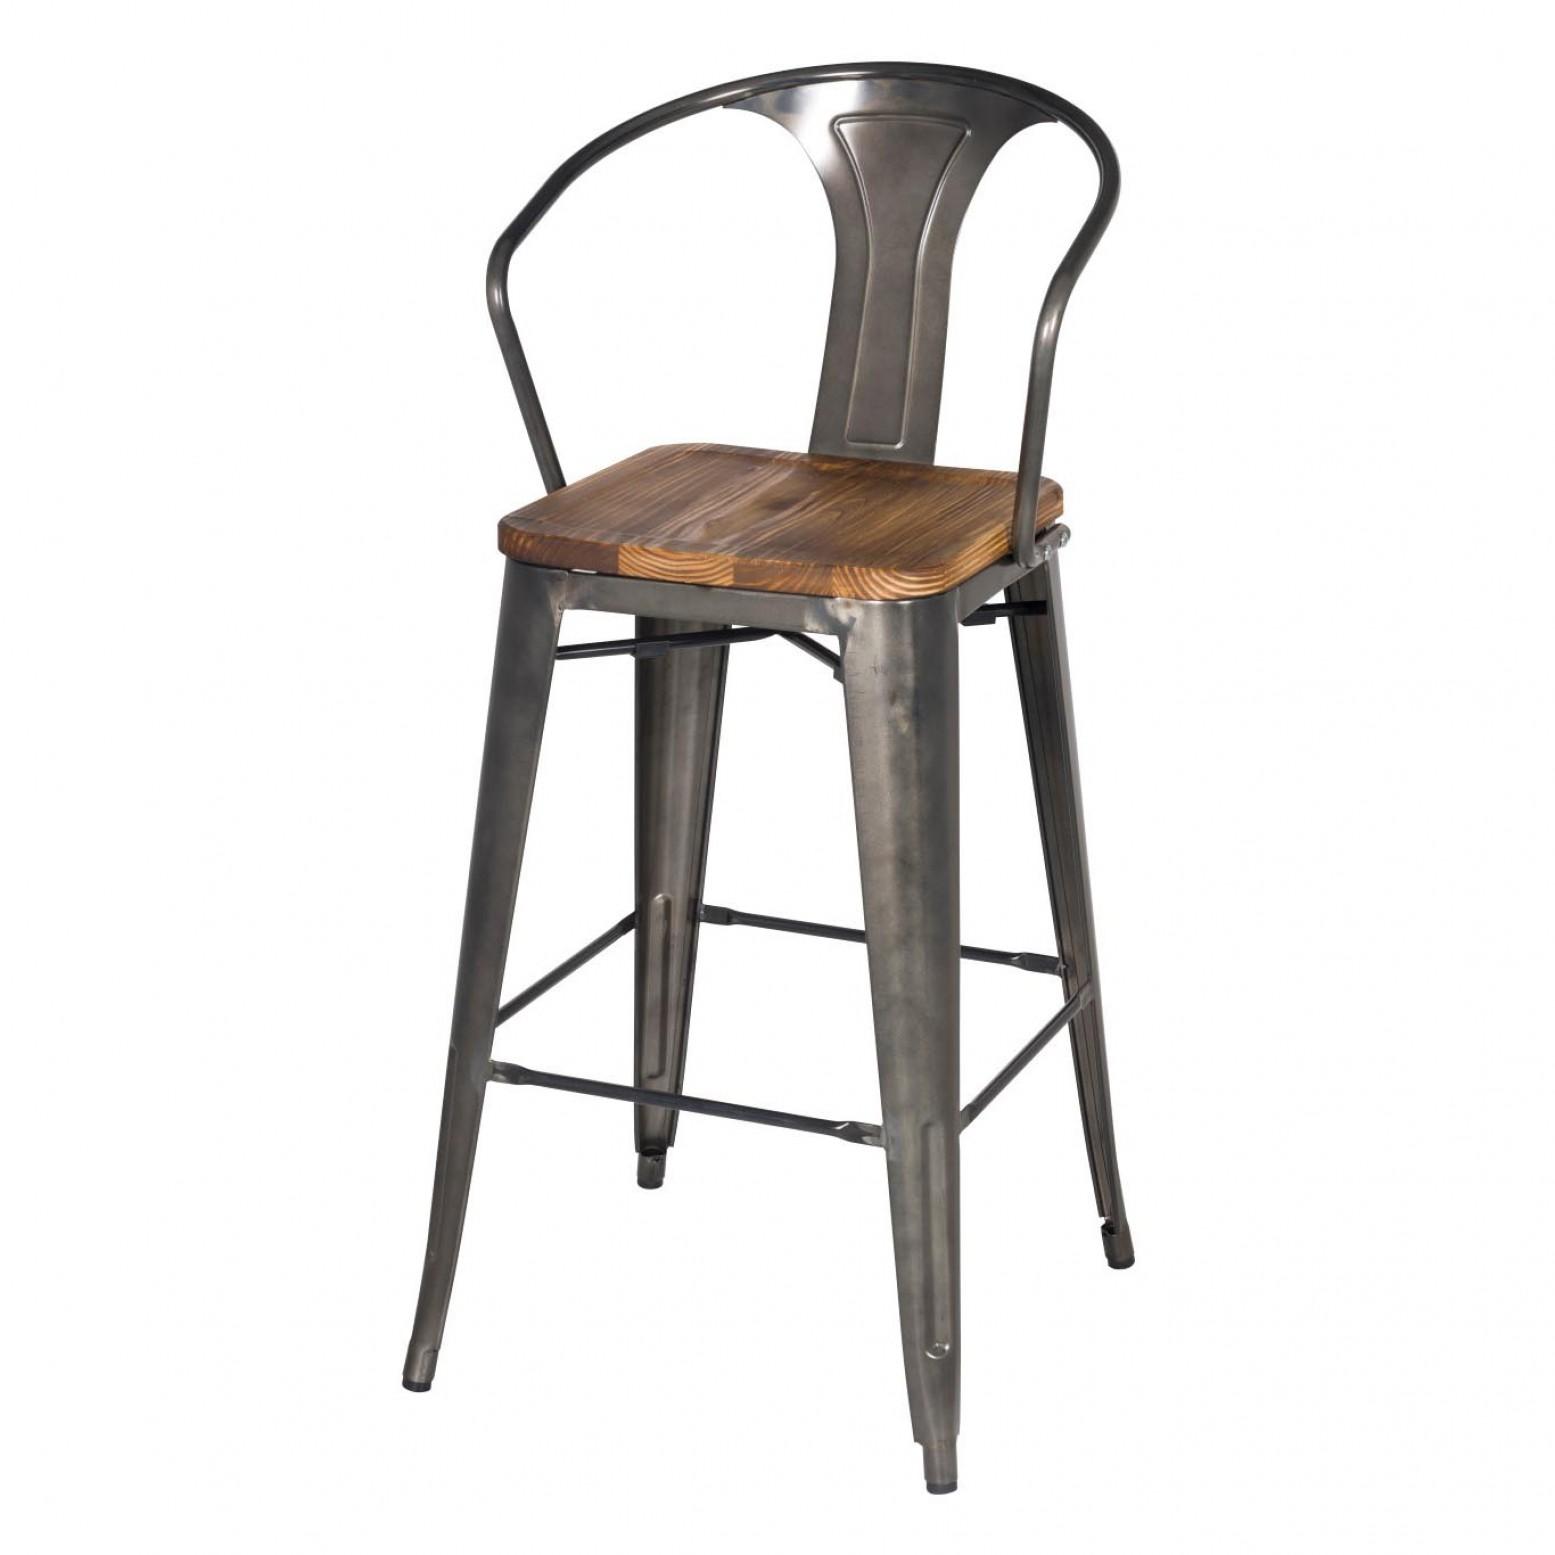 Brilliant Metropolis Metal Bar Stool Wood Seat Gunmetal Caraccident5 Cool Chair Designs And Ideas Caraccident5Info